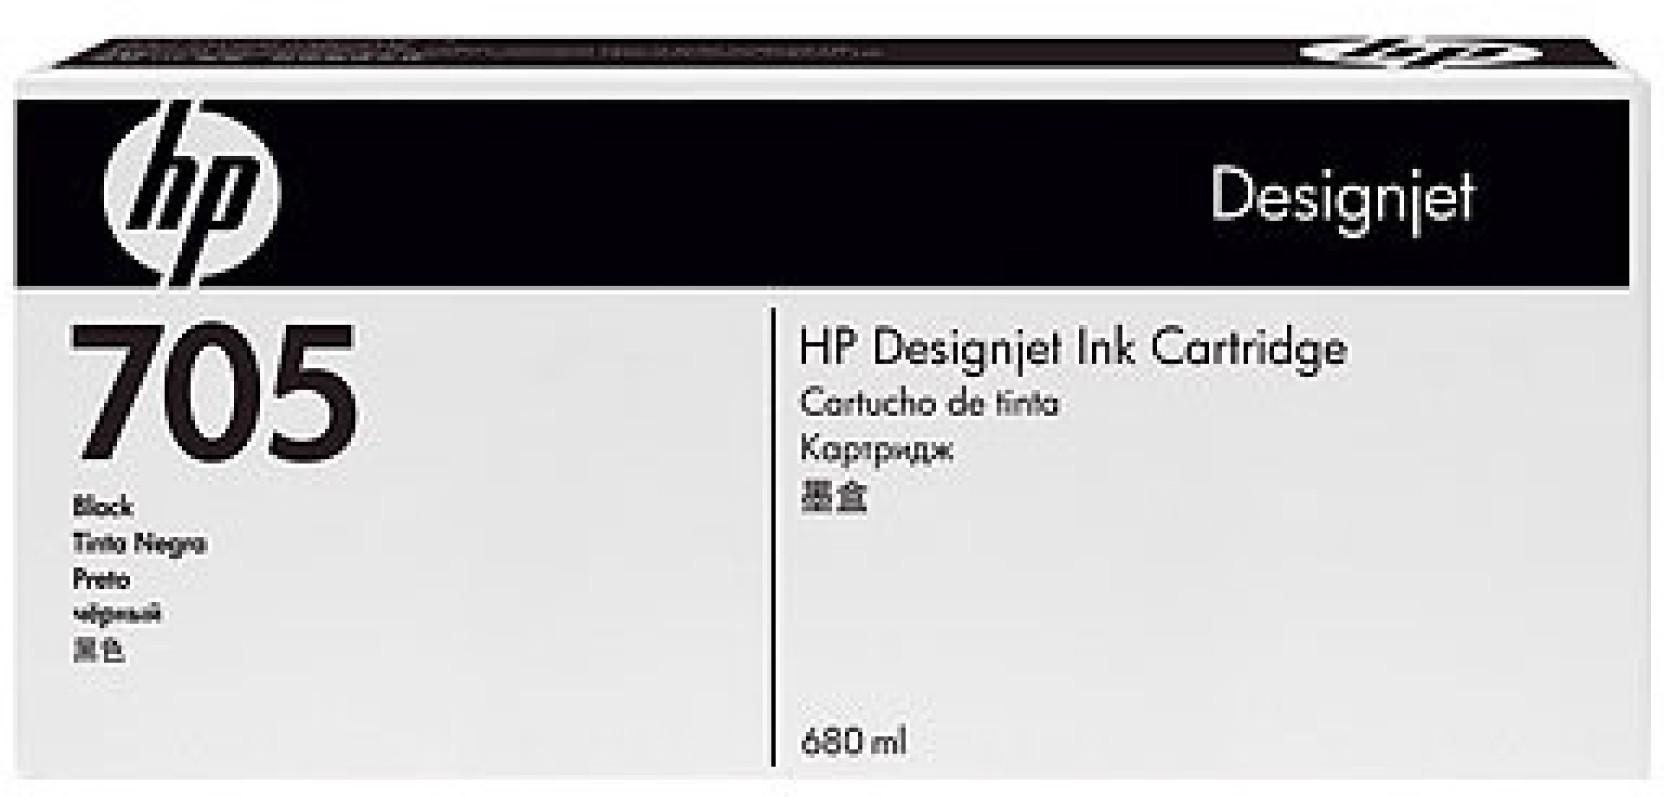 Hp 705 680 Ml Black Ink Cartridge Tinta 45 Original Compare